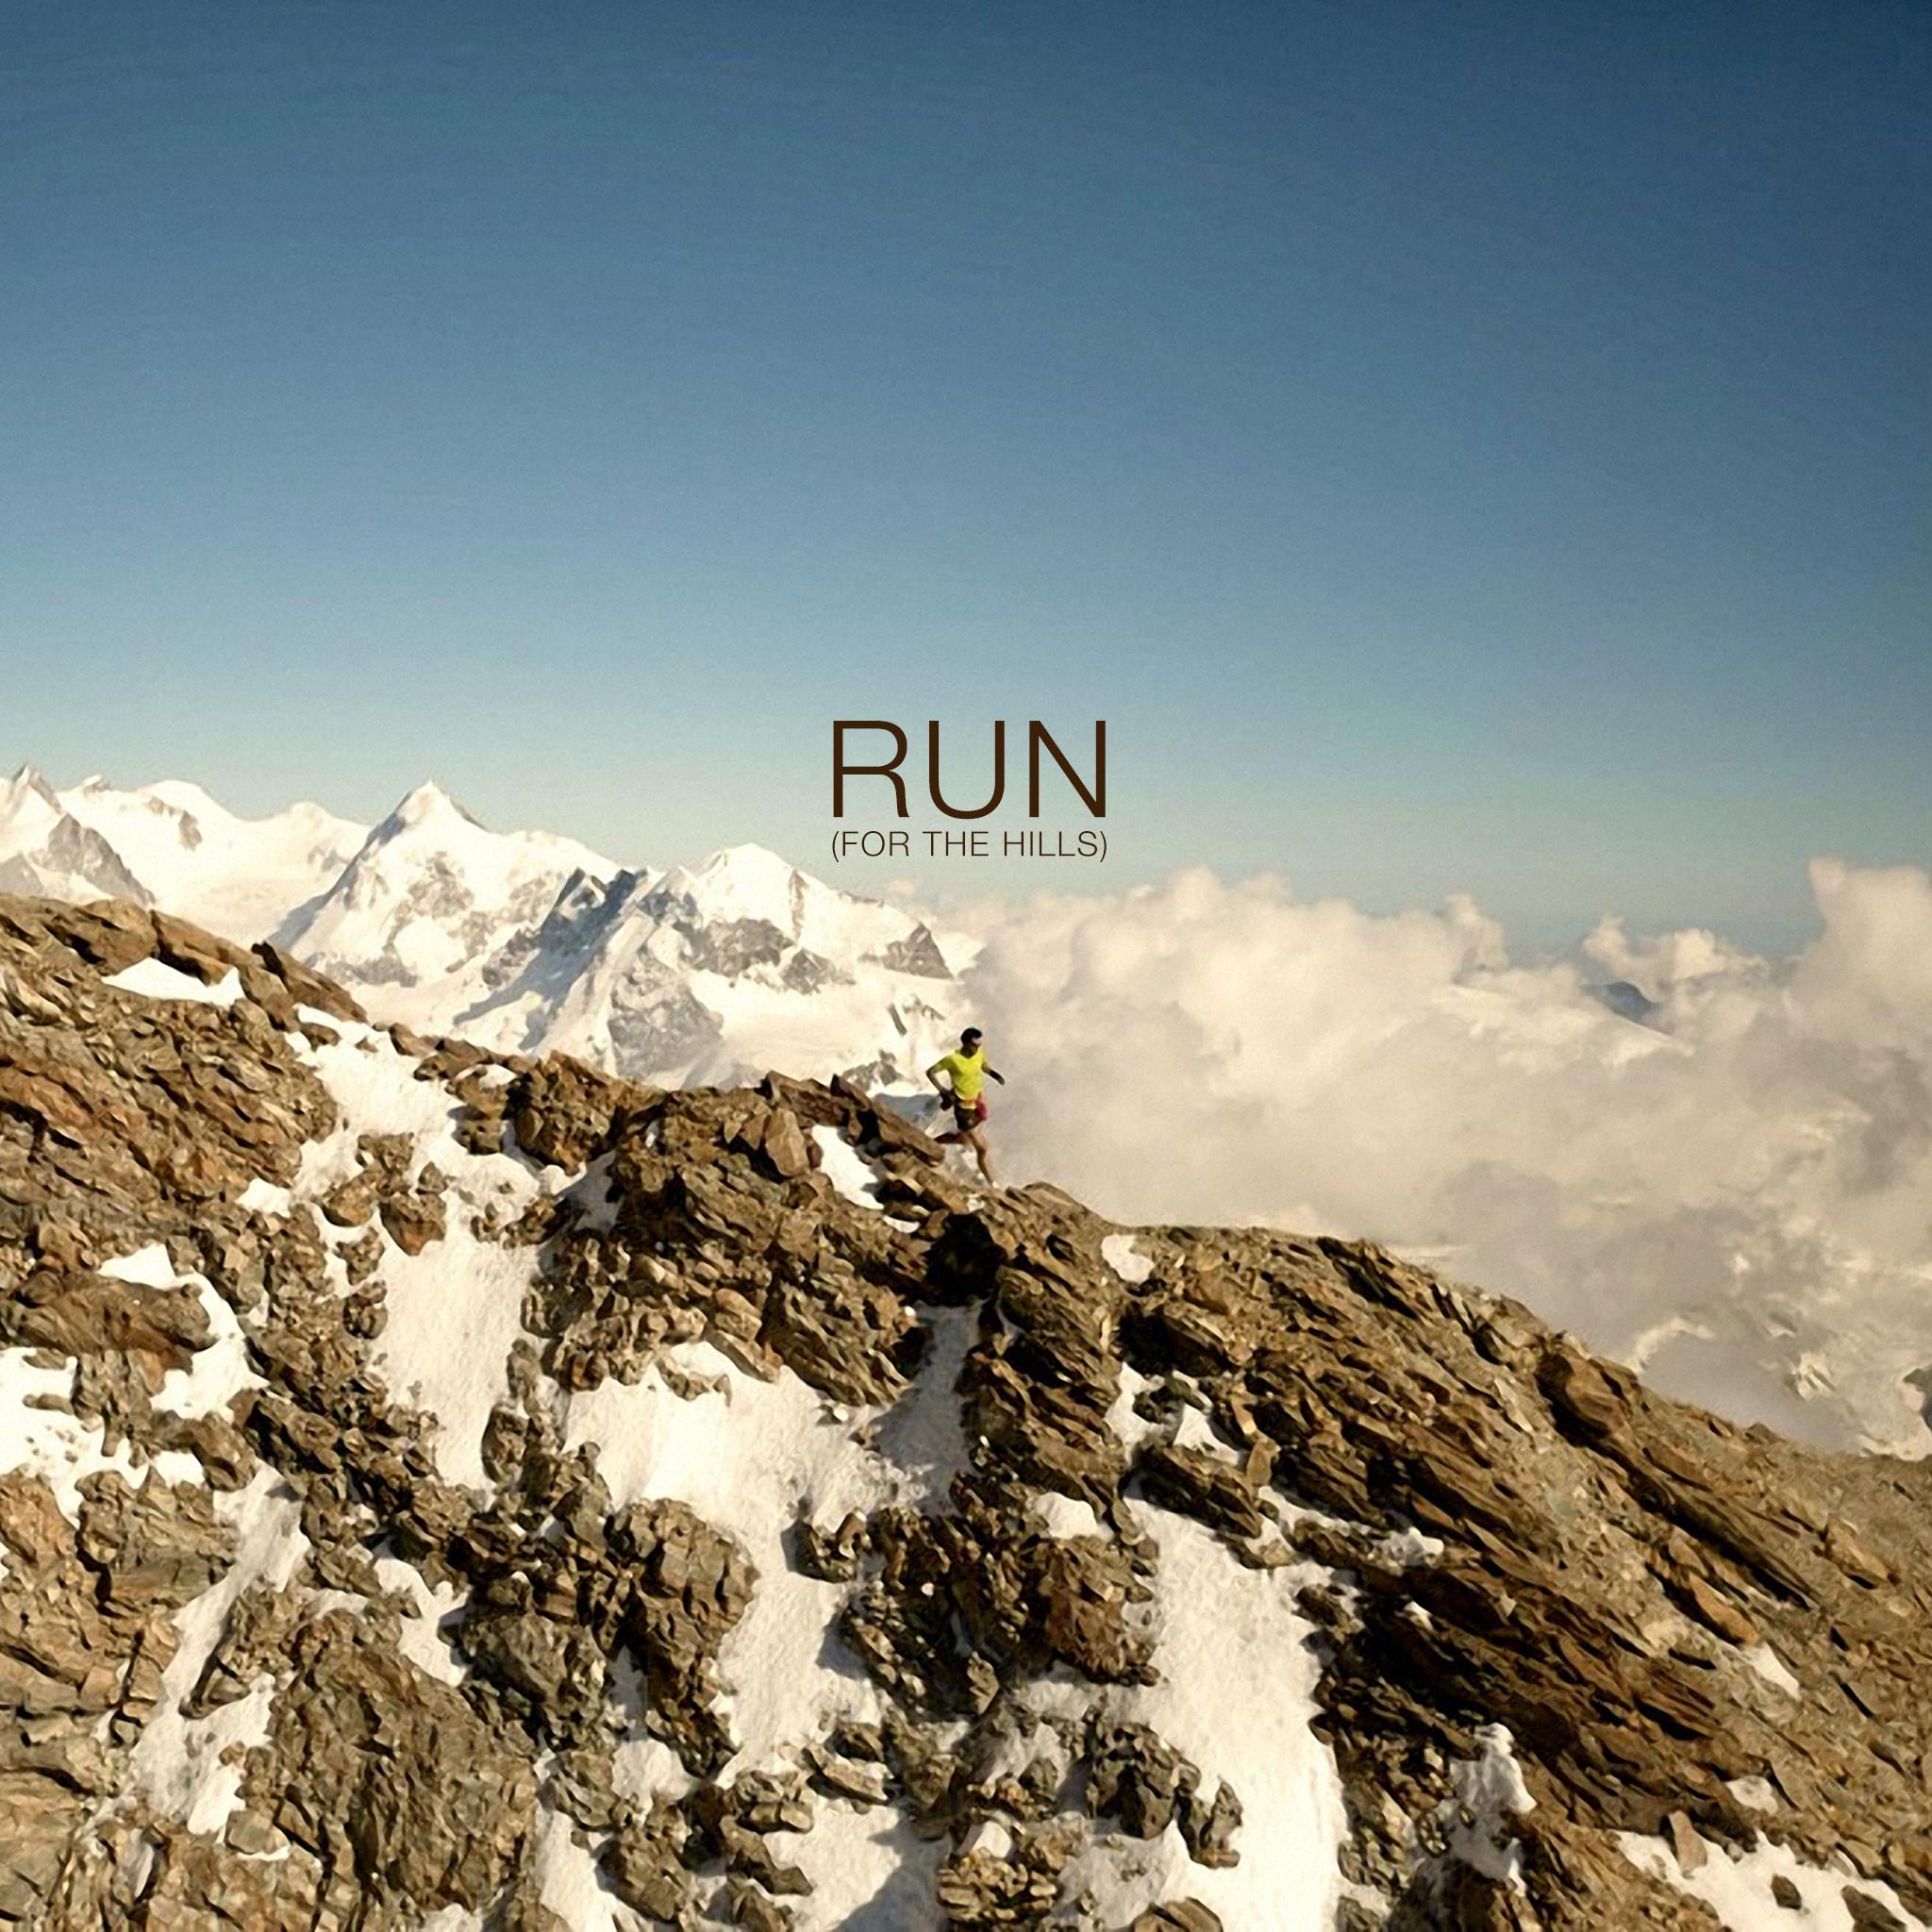 Running Desktop Backgrounds 65 images 2048x2048